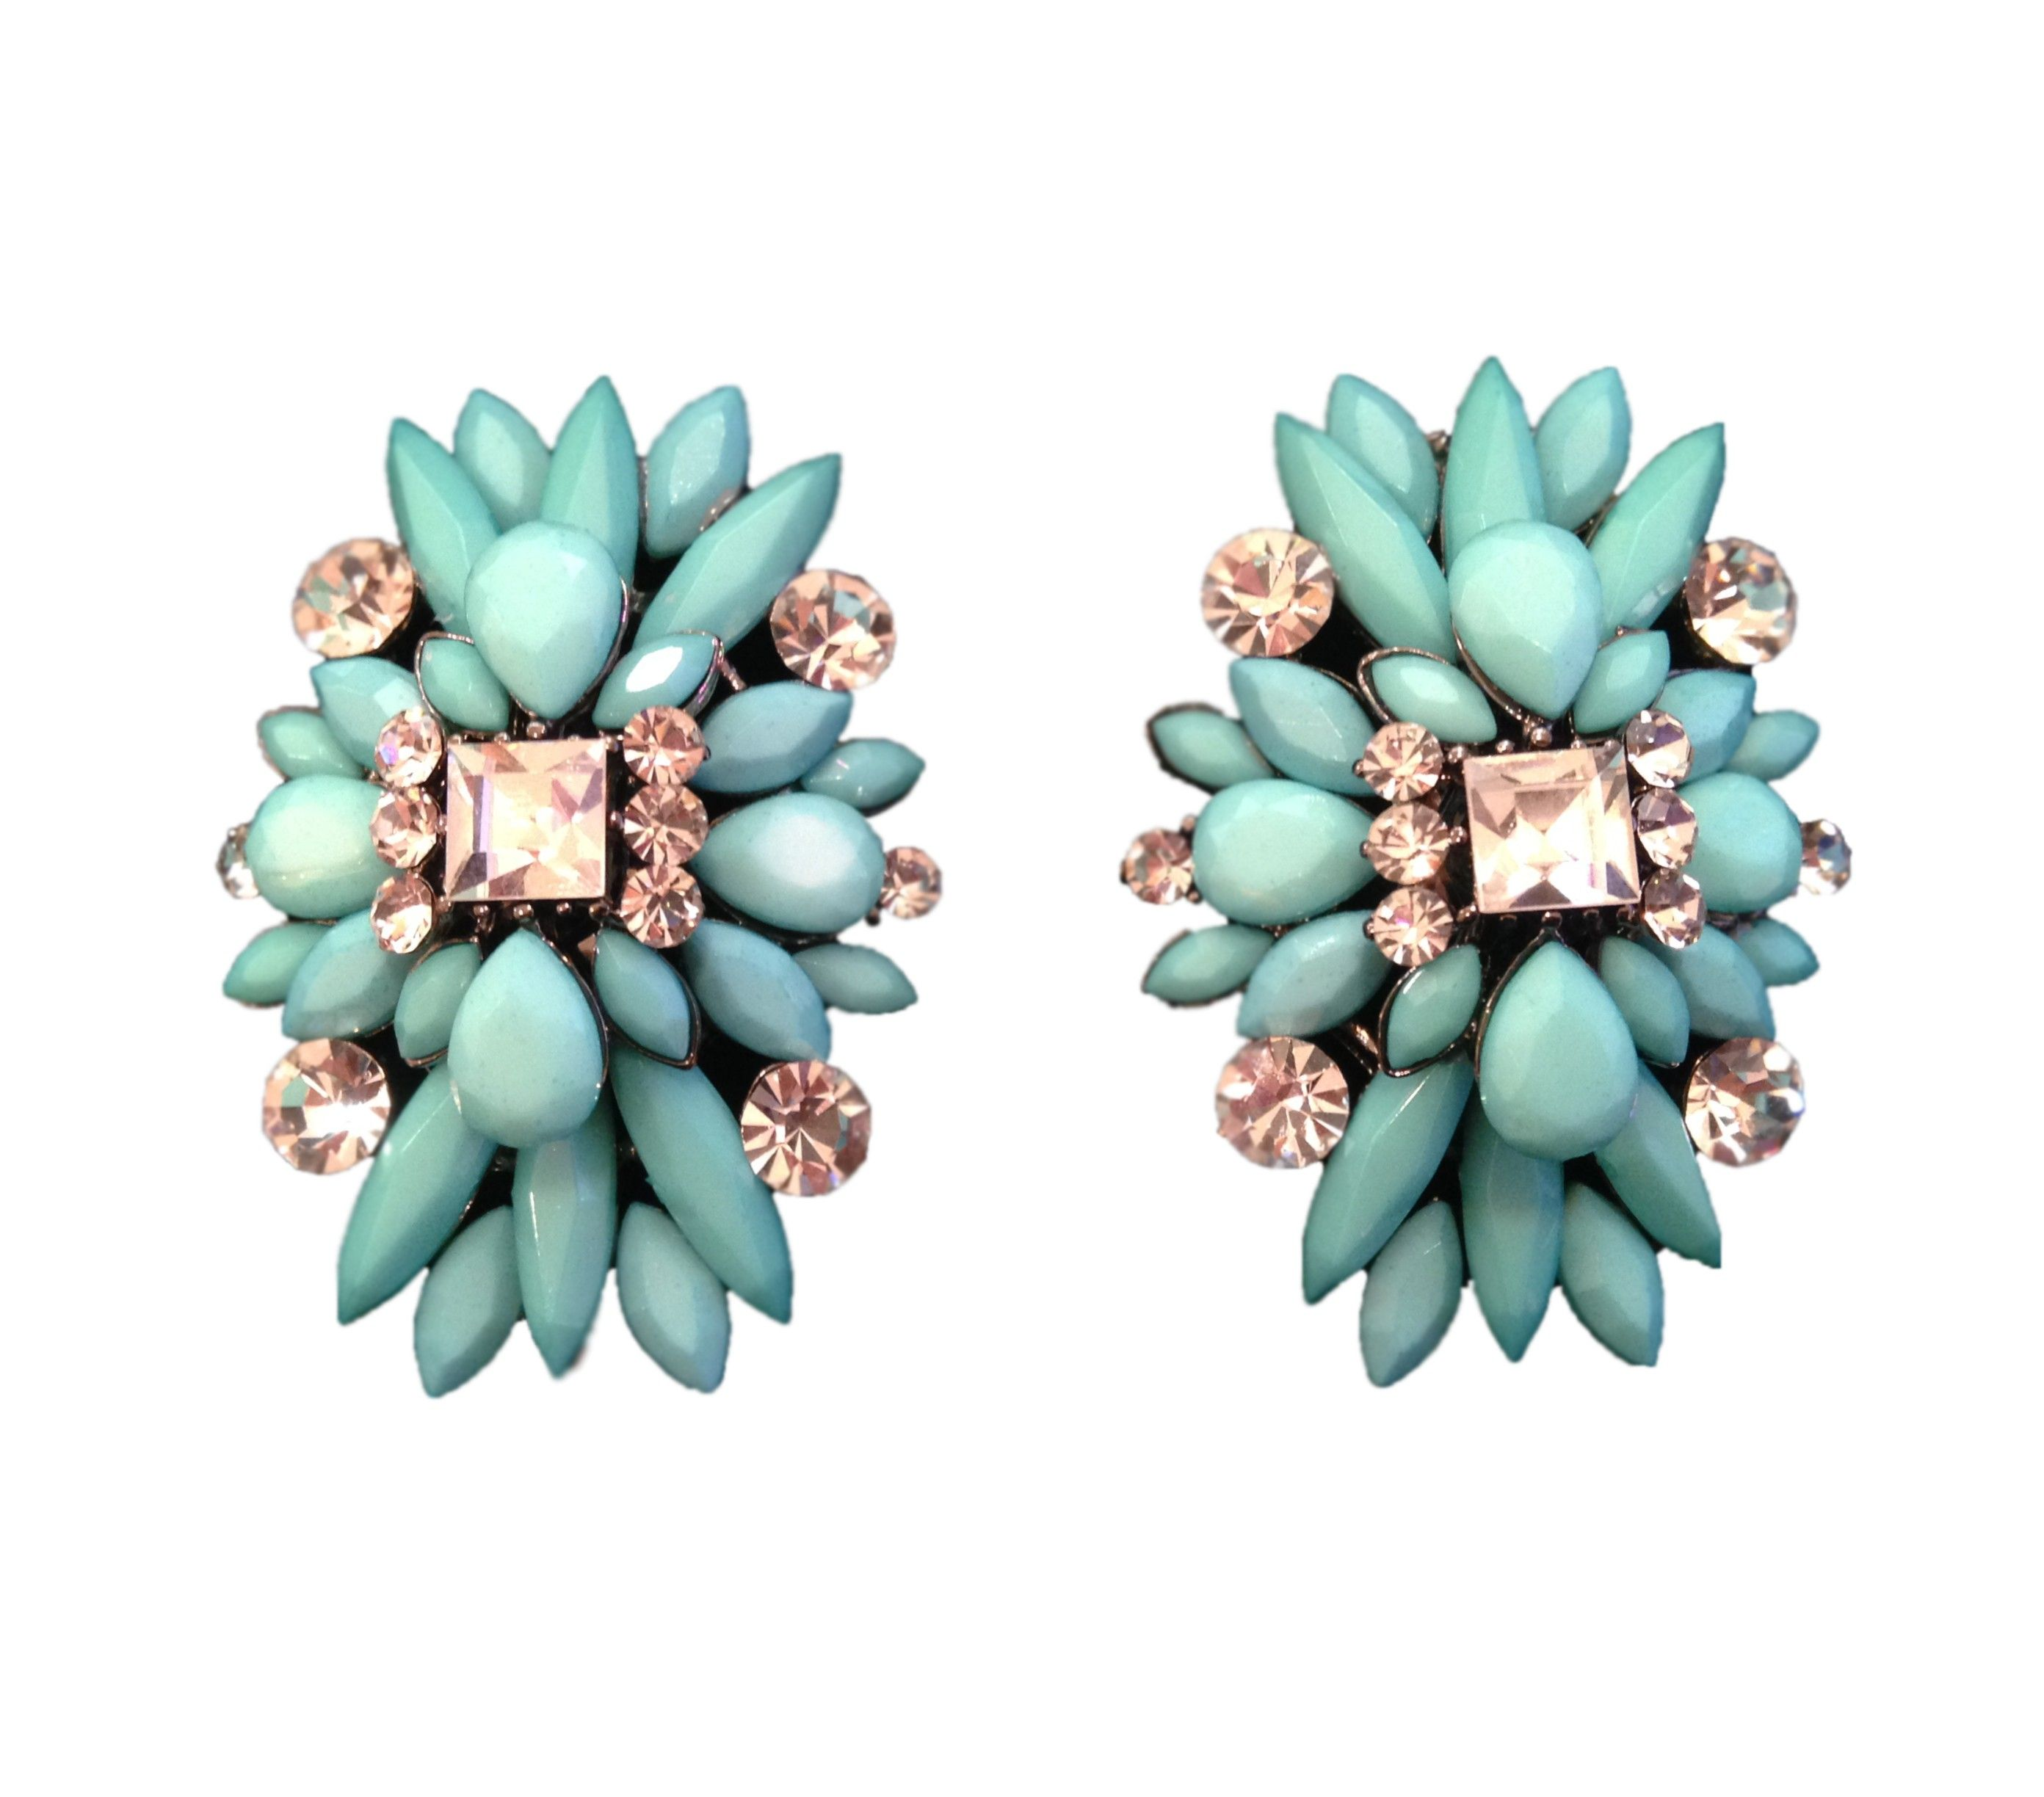 Turquoise & Swarkovski Crystal Statement Earrings